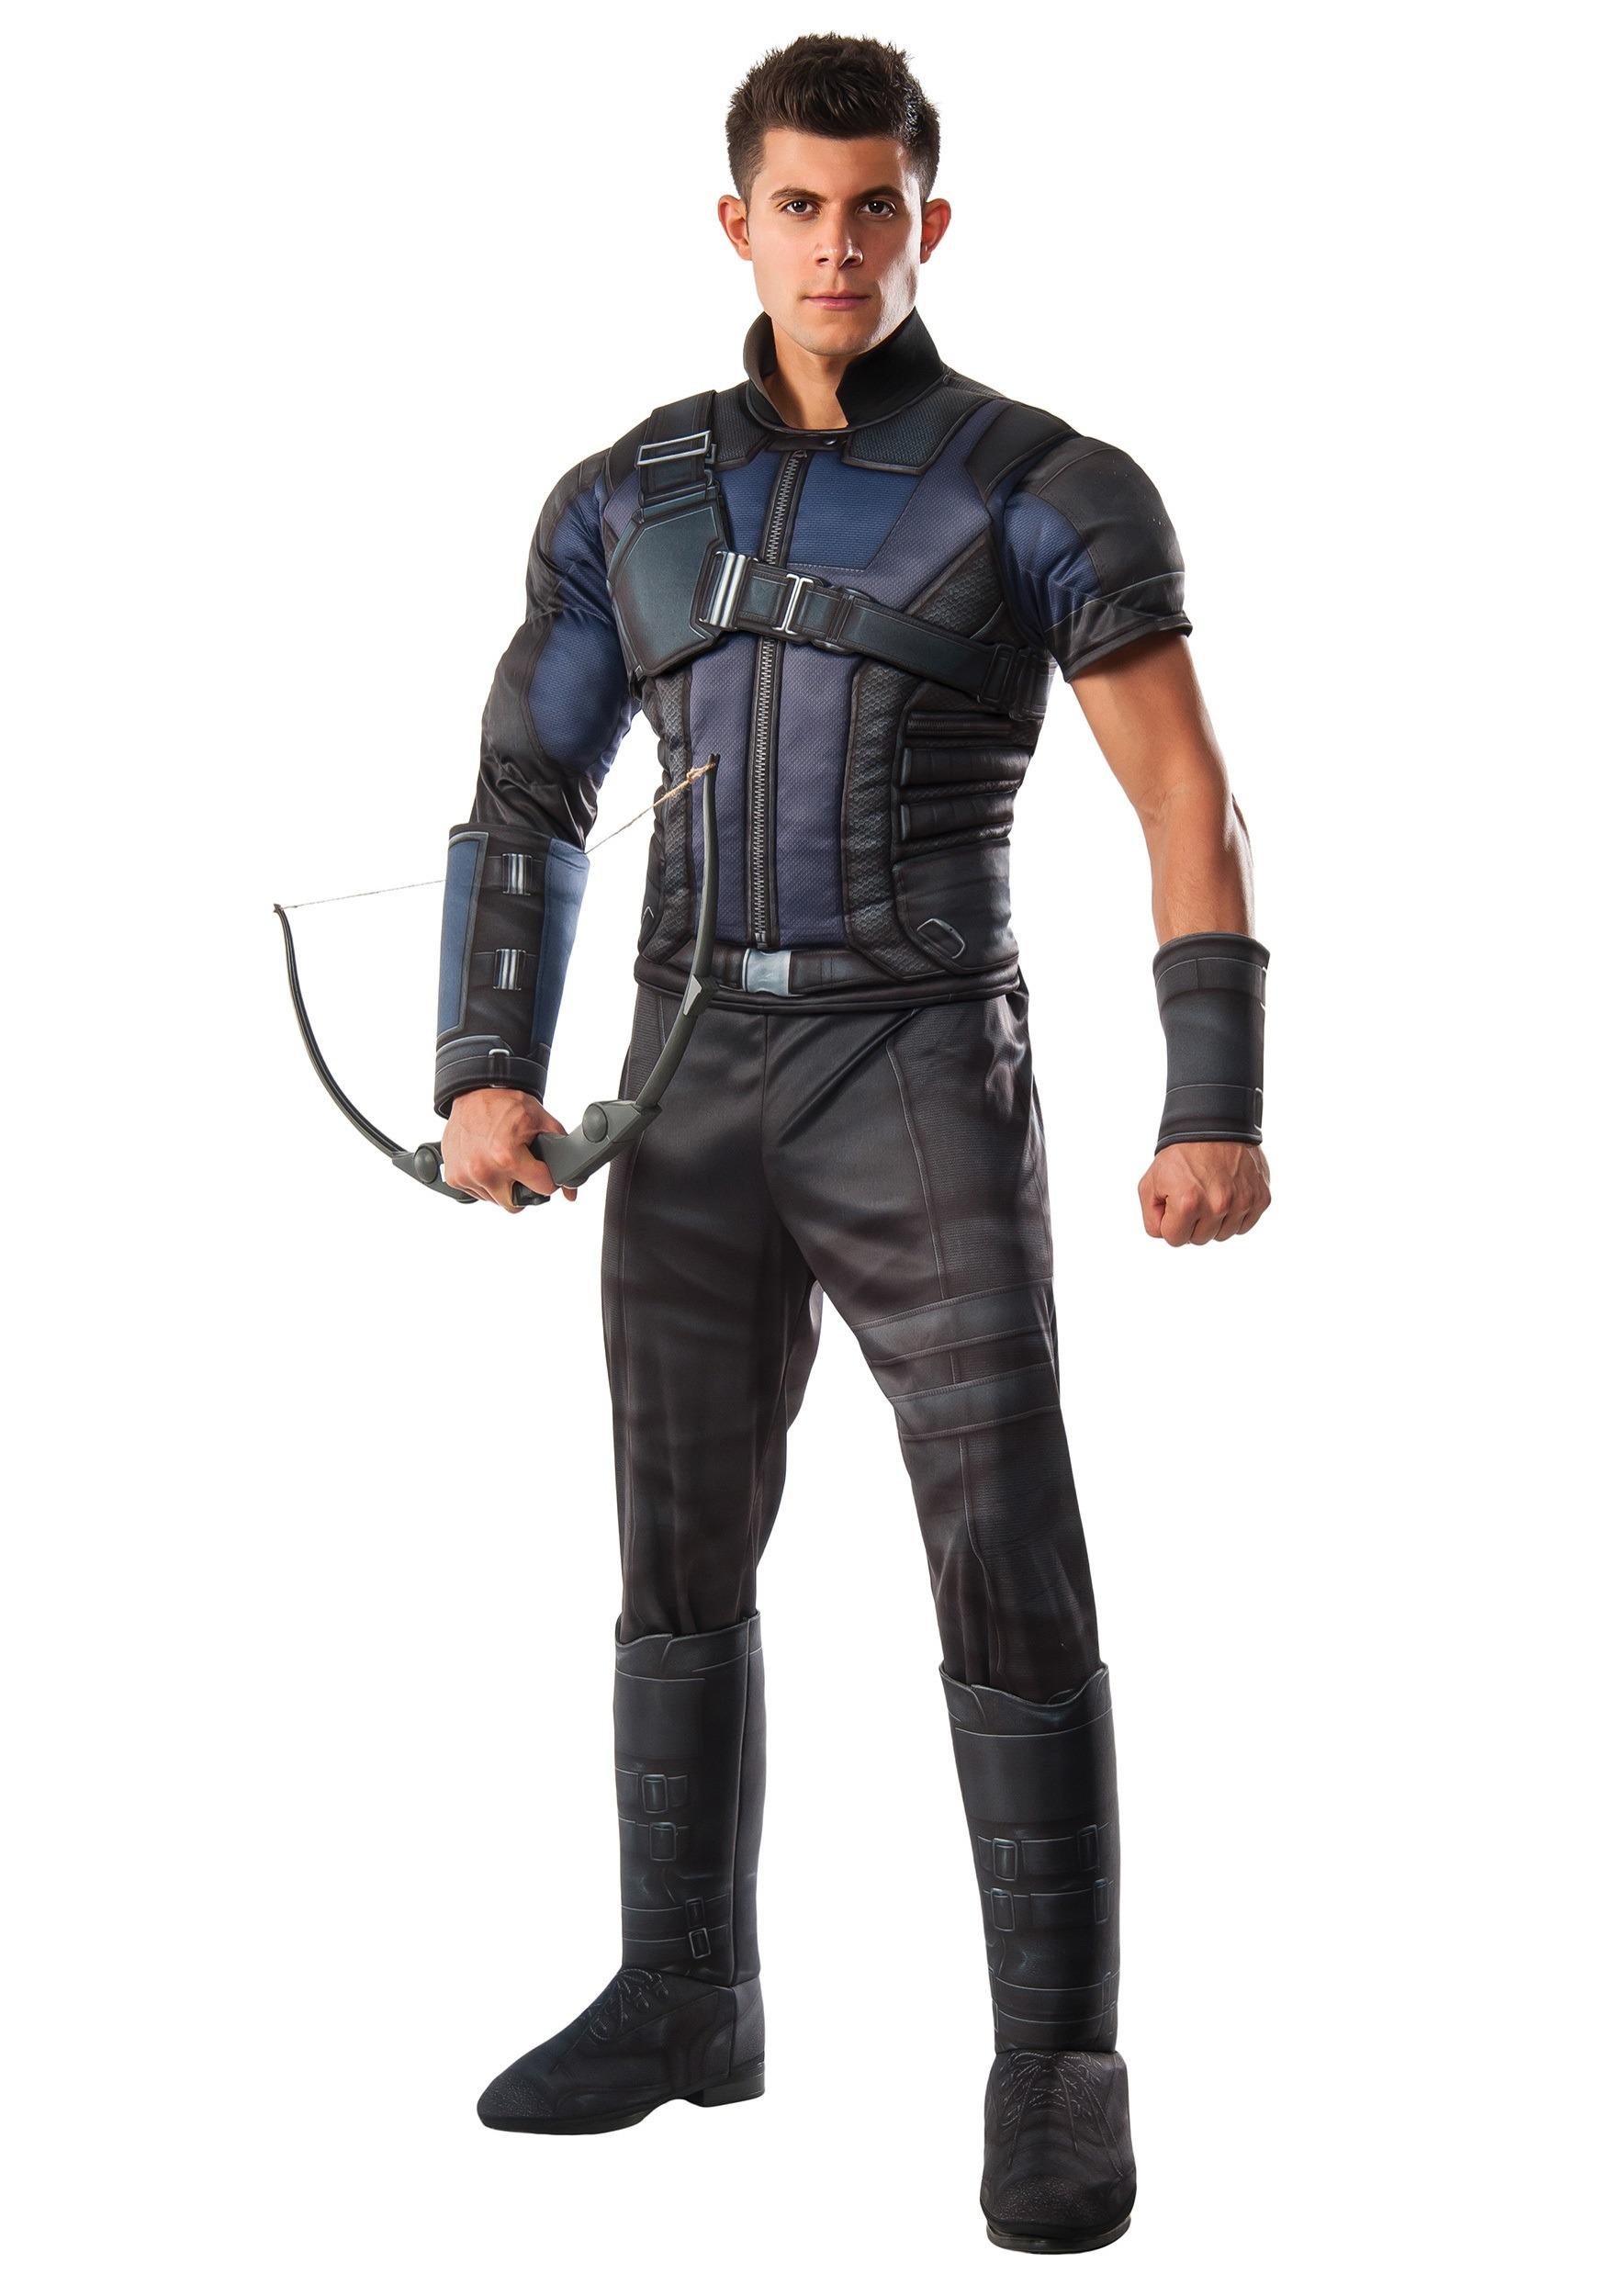 Deluxe Hawkeye Civil War Men's Costume RU810972